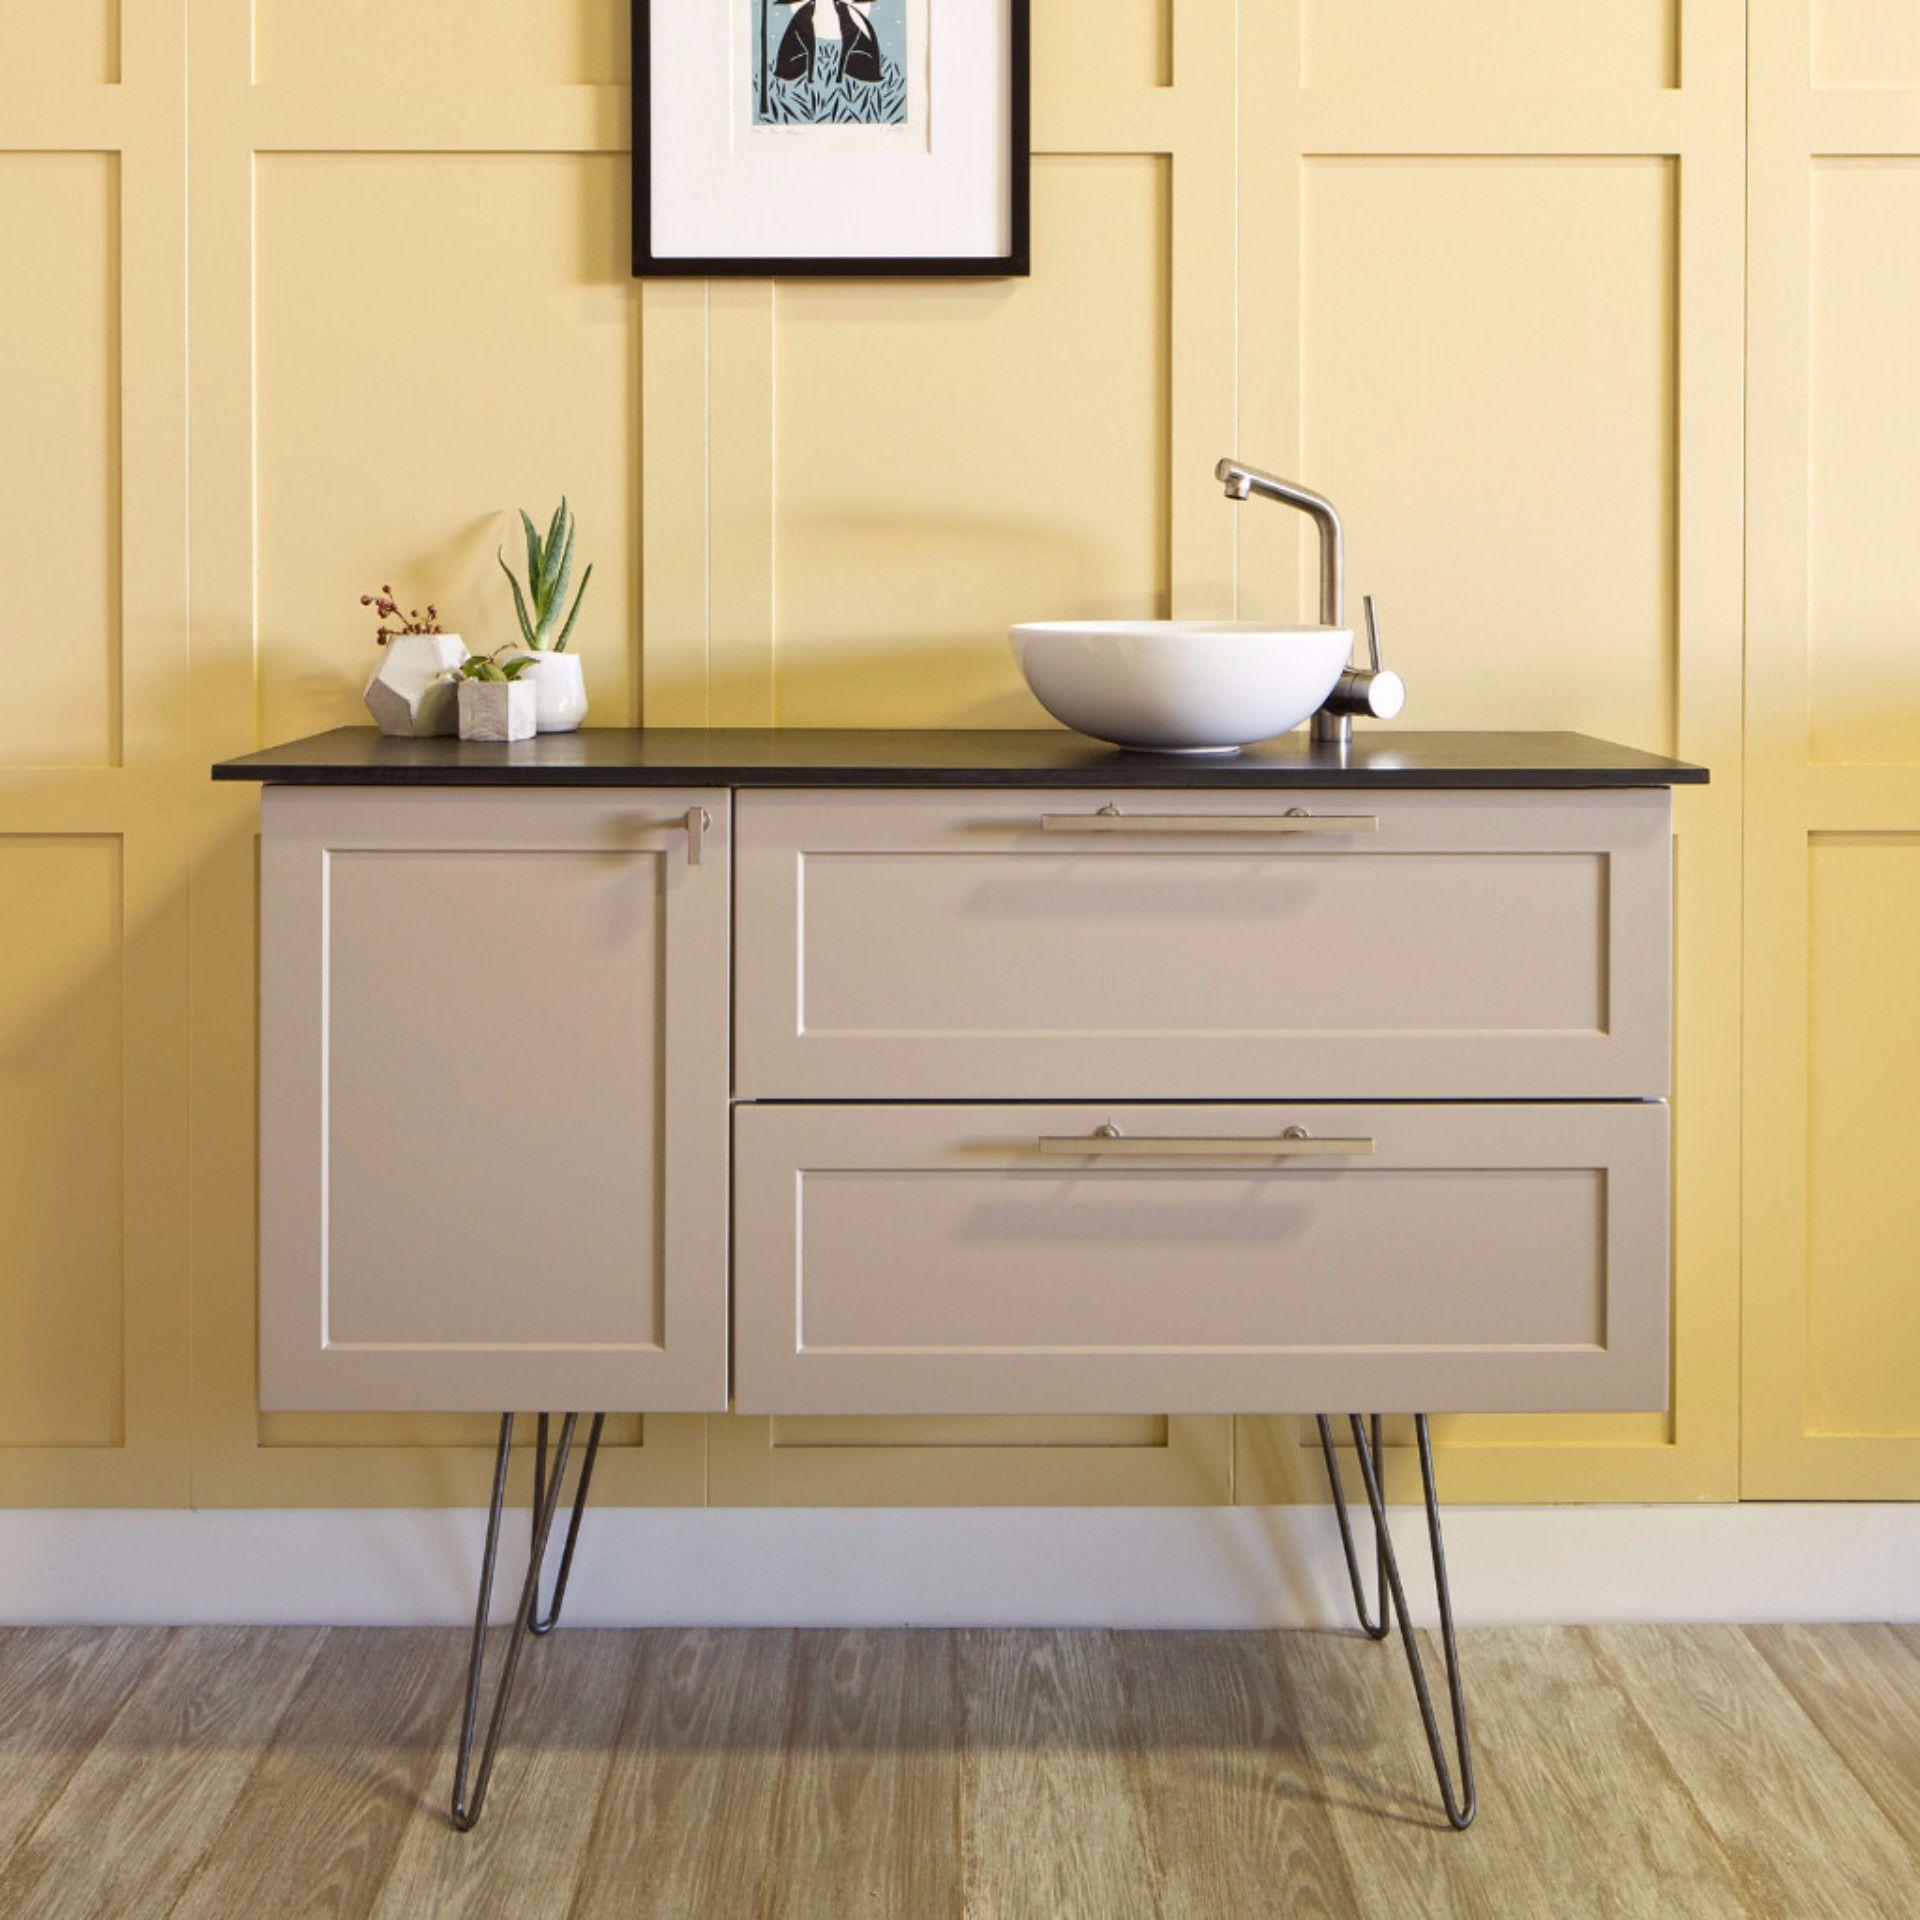 Semihandmade nicer Ikeastyle furniture. Cool vanity